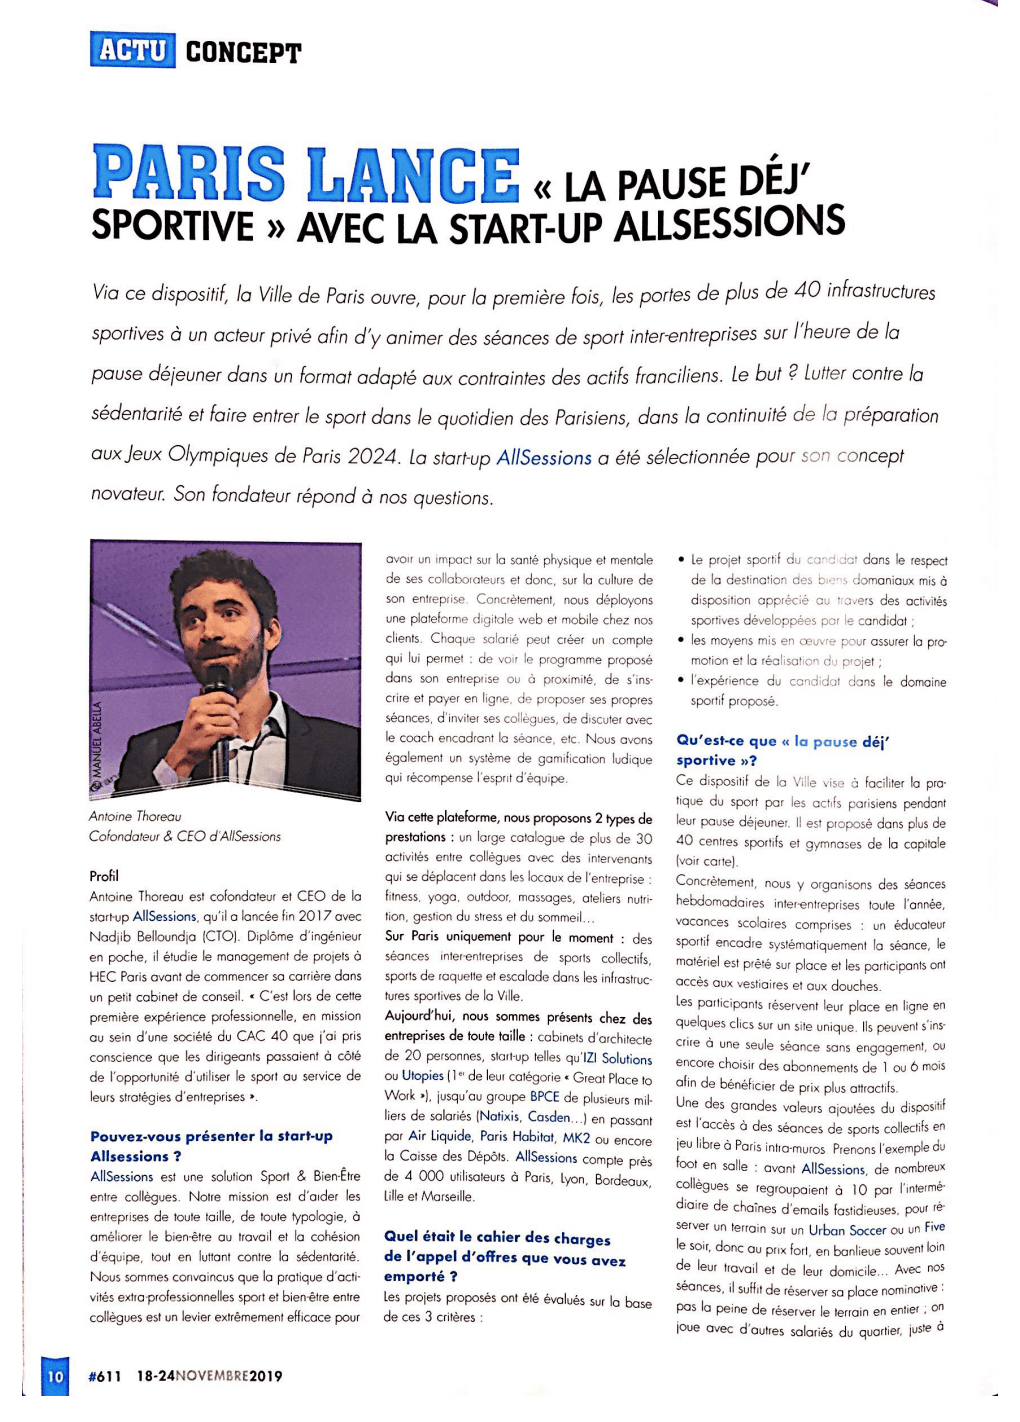 Sport Stratégies interview Antoine Thoreau CEO AllSessions